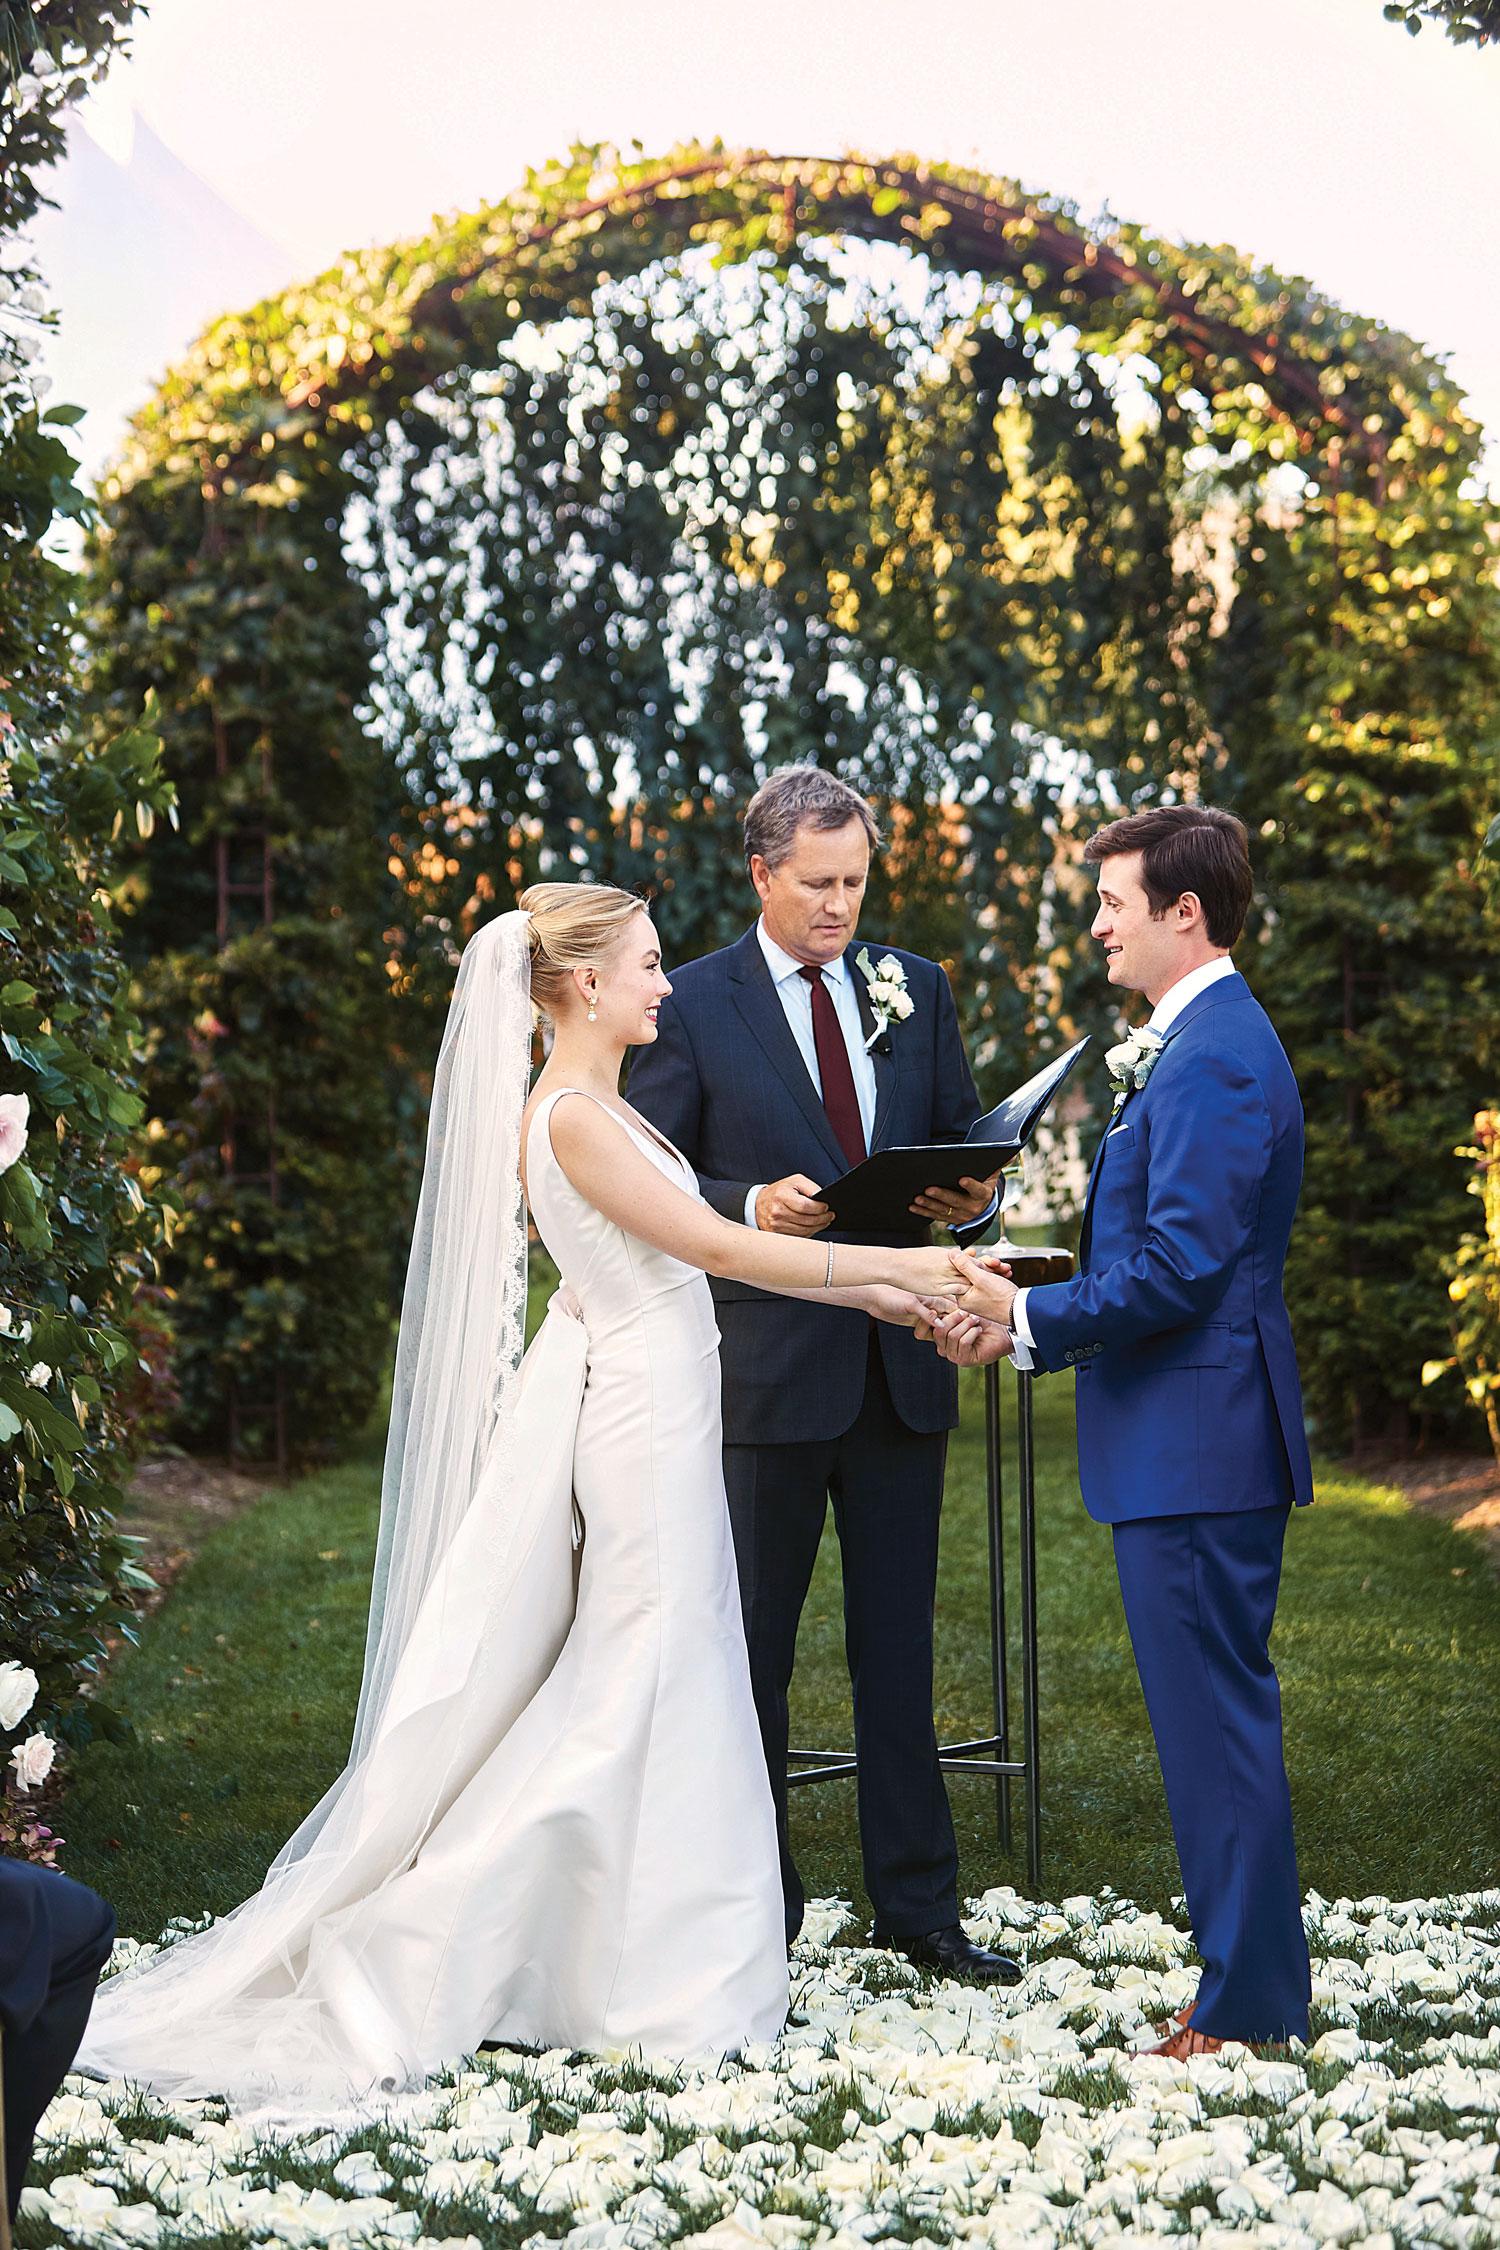 Johnson wedding ceremony arch outdoor ceremony mark ingram atelier Inside Weddings fall 2018 issue